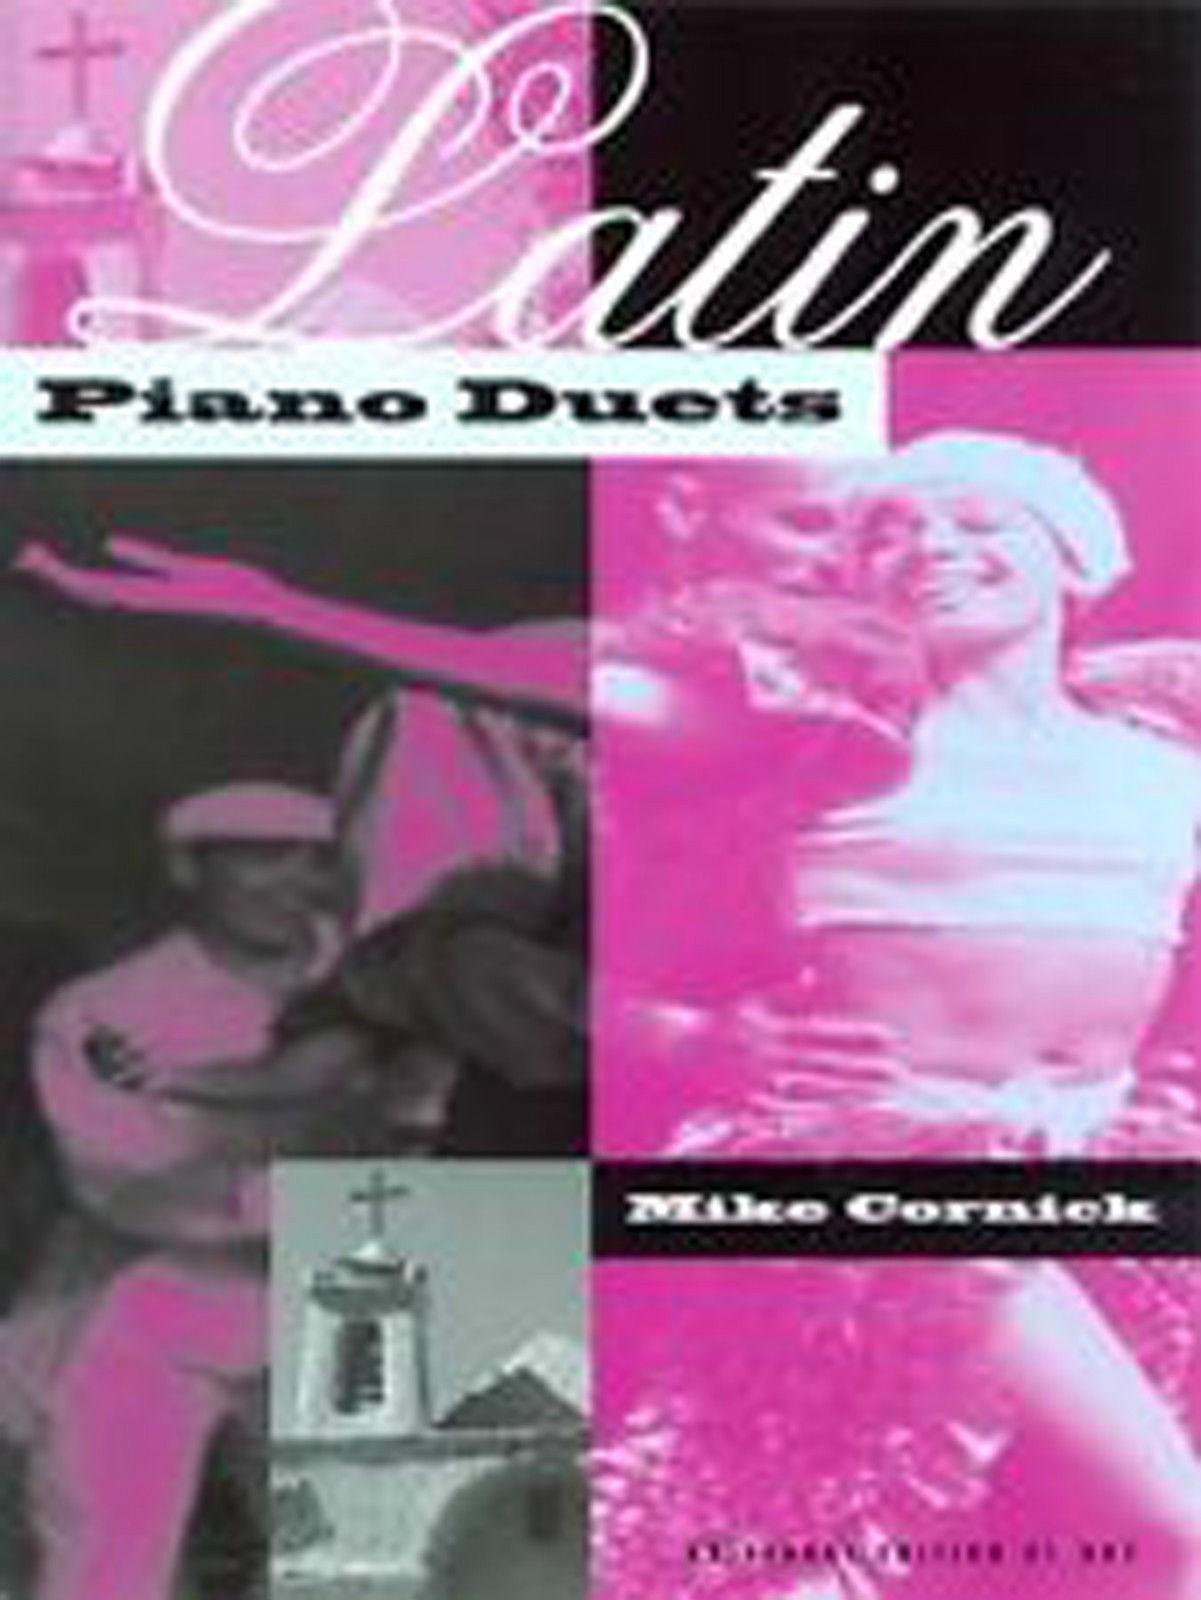 Latin Piano Duets 4 Hands Book 6 Pieces 2 Suites Samba Tango Cornick B53